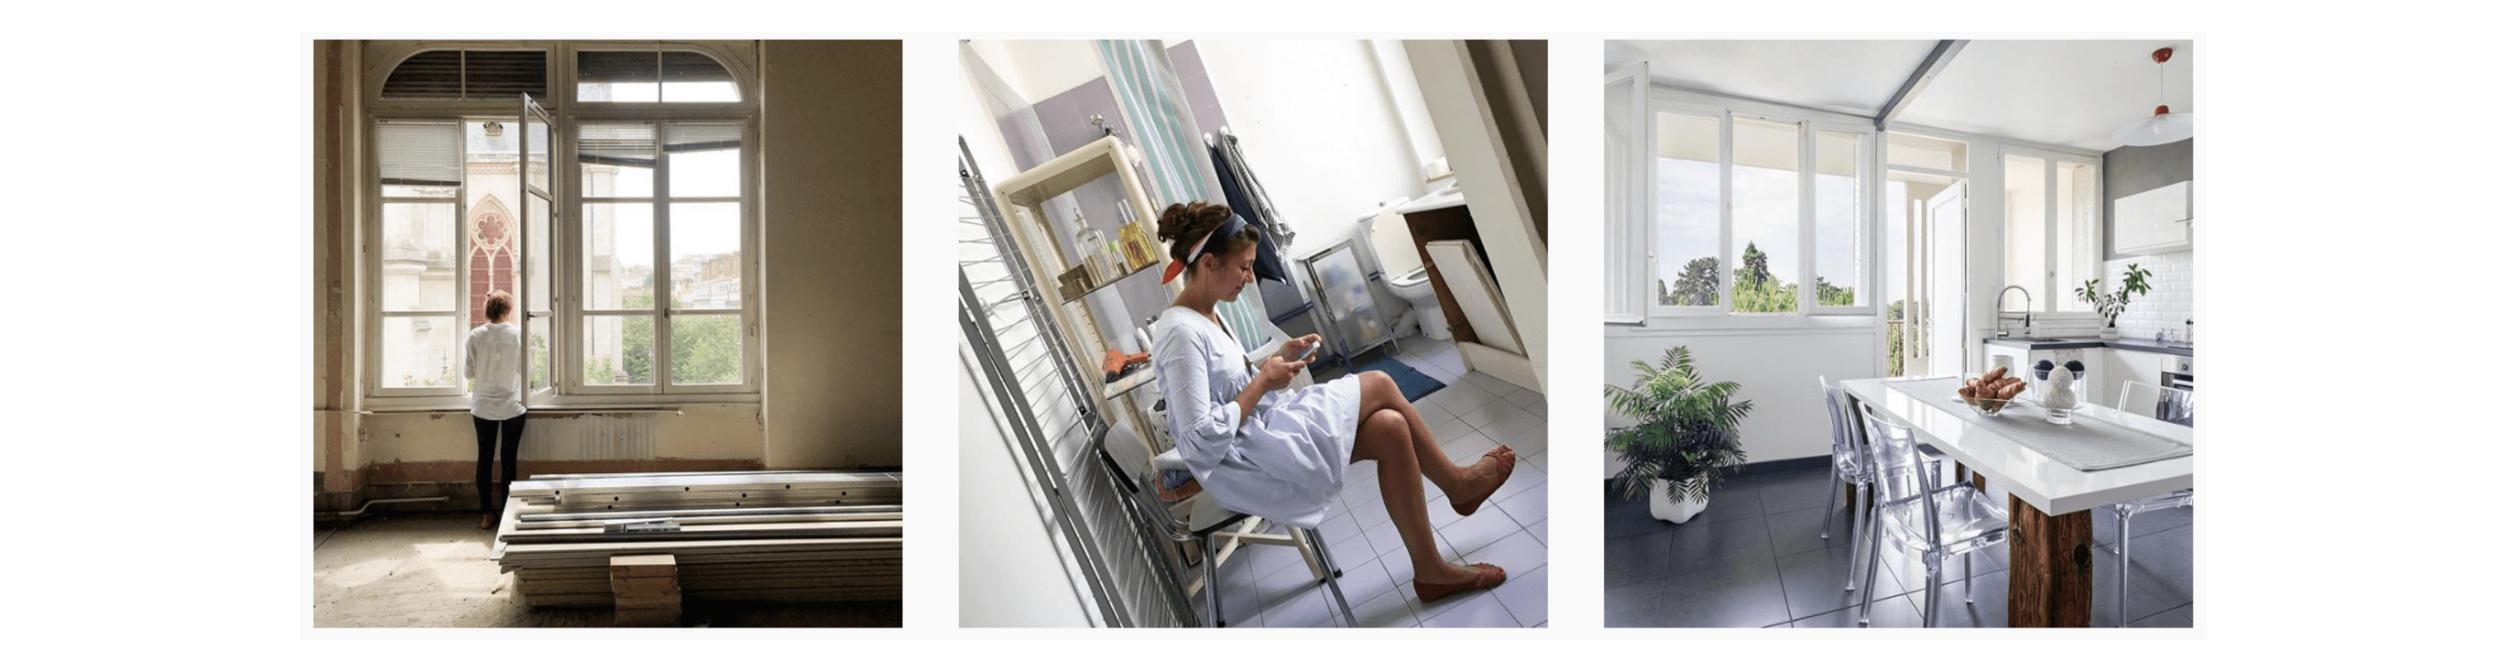 bumper-blog-news-immobilier-lyon-appartement-vente-achat-investir-homestaging-design-decoration-lifestyle-art-3.png